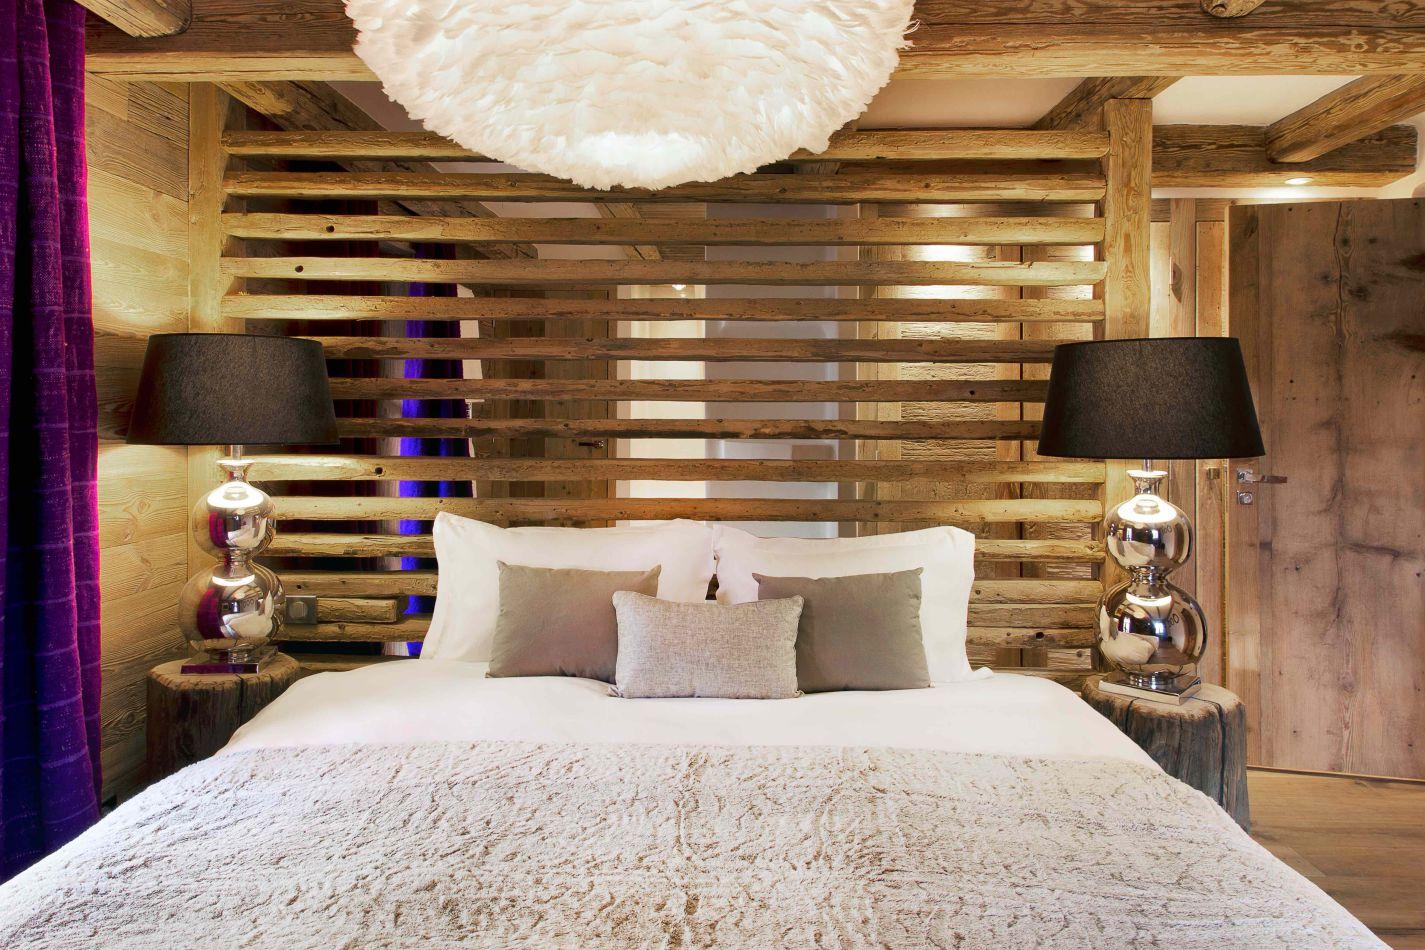 ad-vieux-pont-bedroom-1